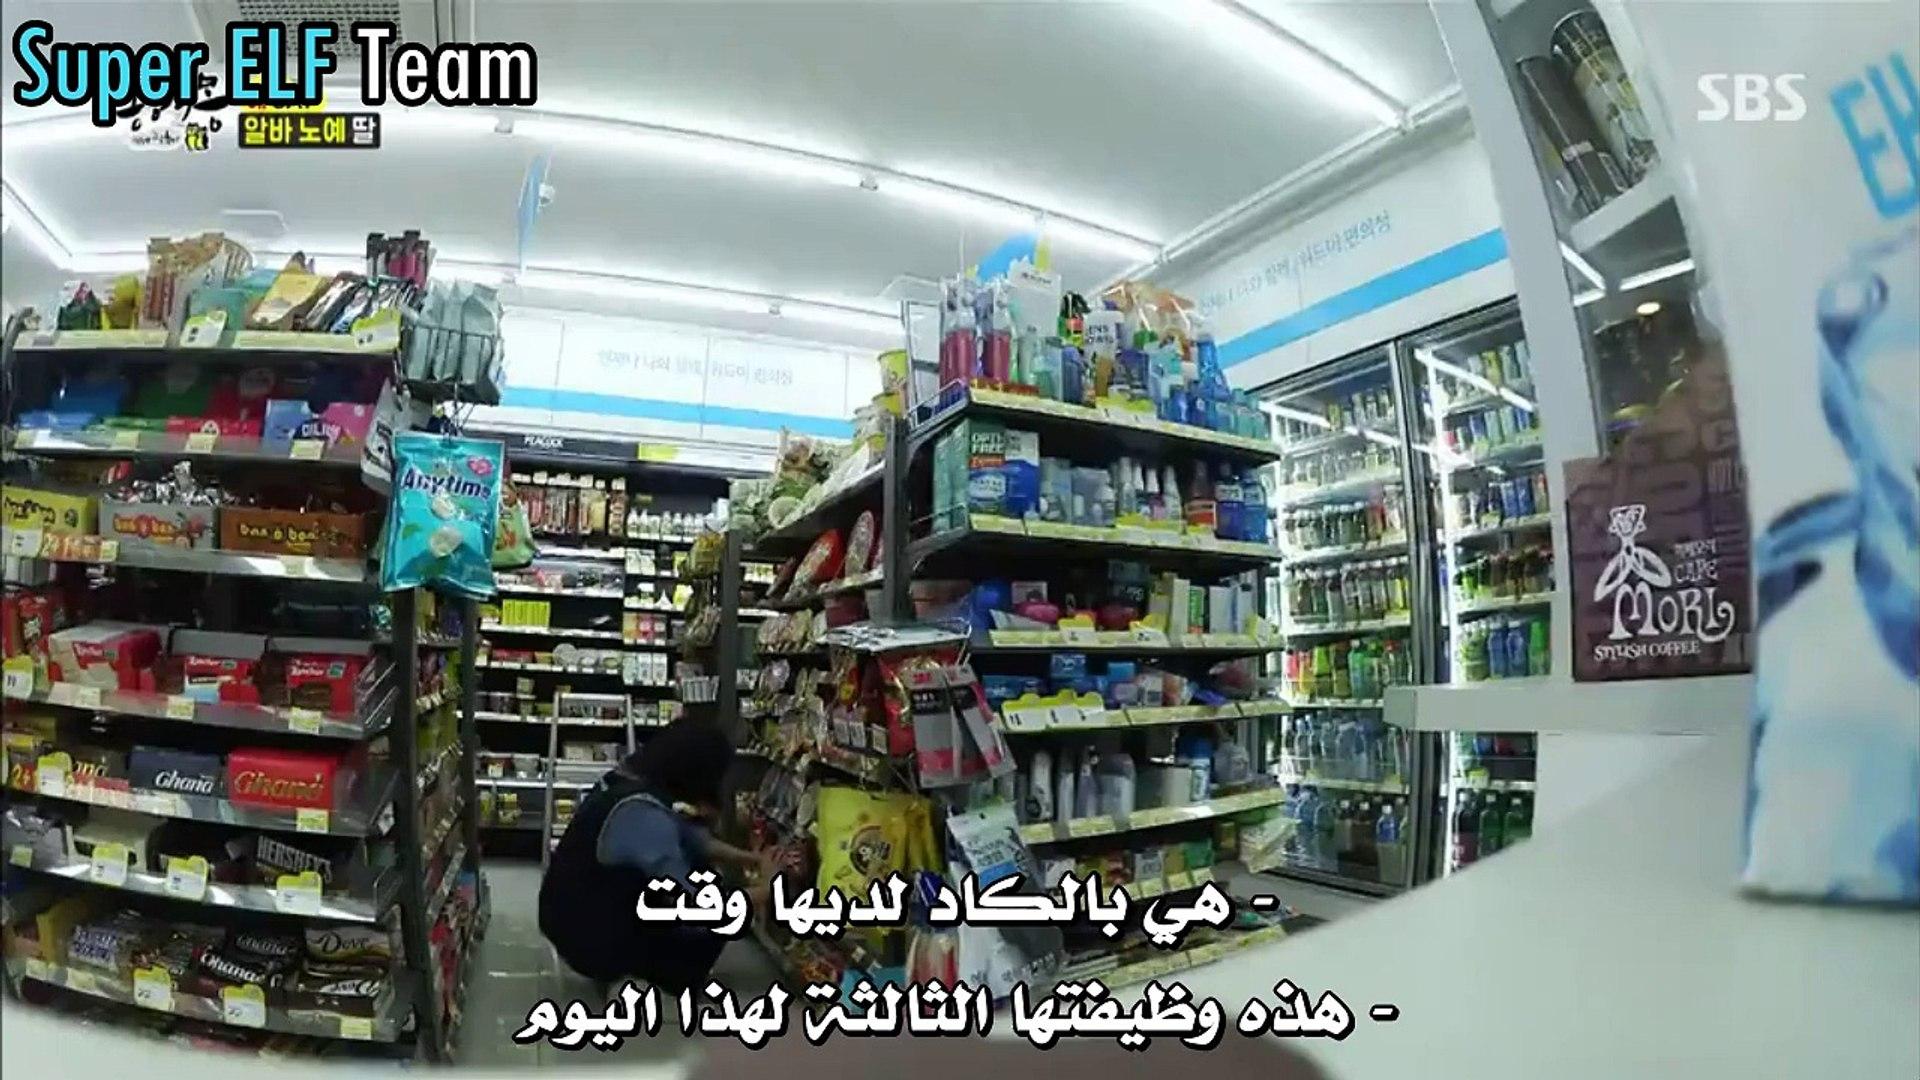 Same Bed Different Dream Ep45 Kyuhyun Arabic Sub Super Elf Team Cut1 Video Dailymotion